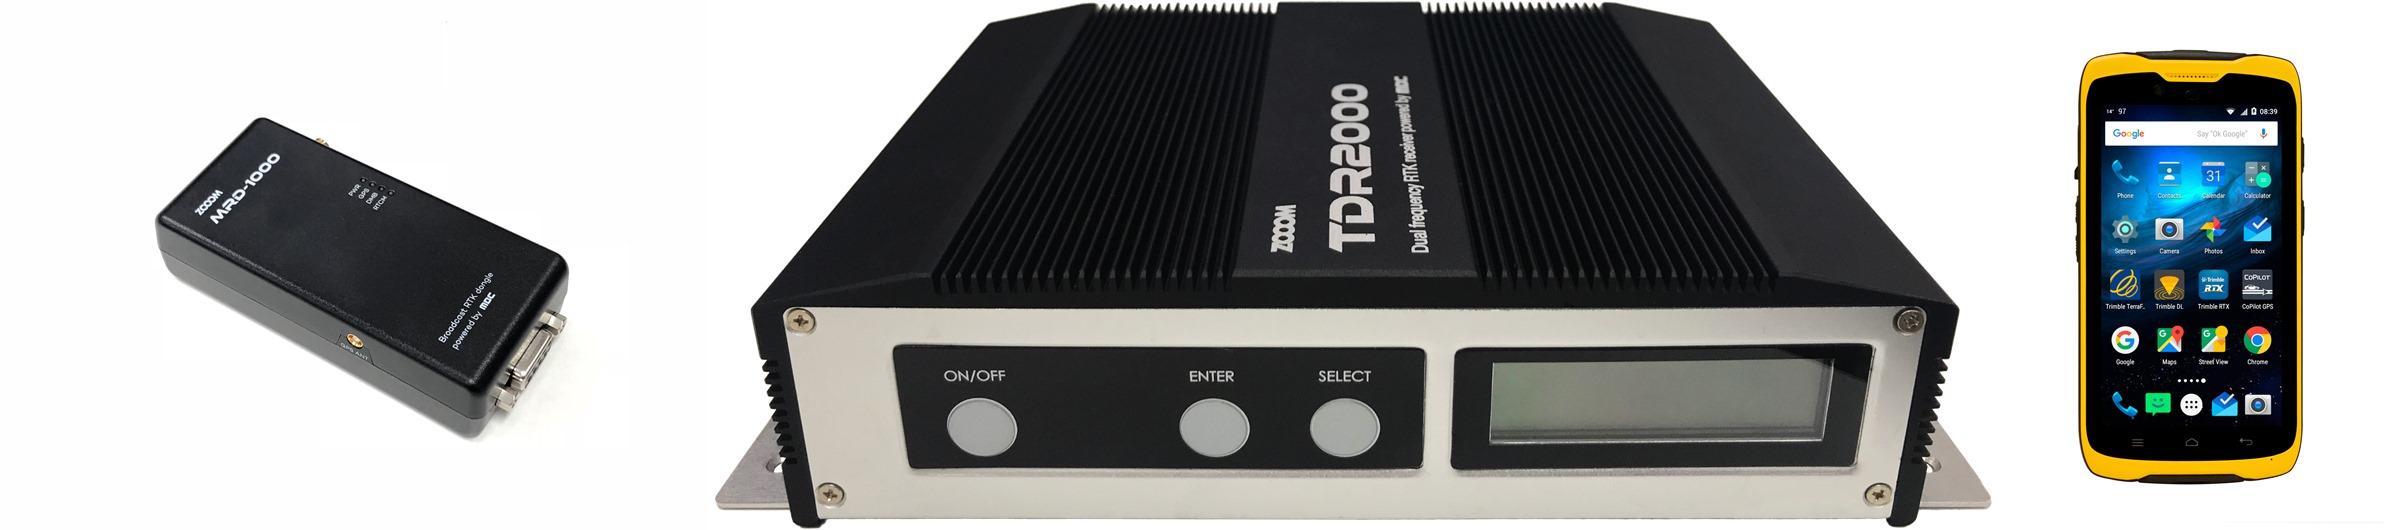 B'RTK 동글 MRD-1000, B'RTK 일체형 단말 TDR2000,  IP 캐스트 RTK 서비스